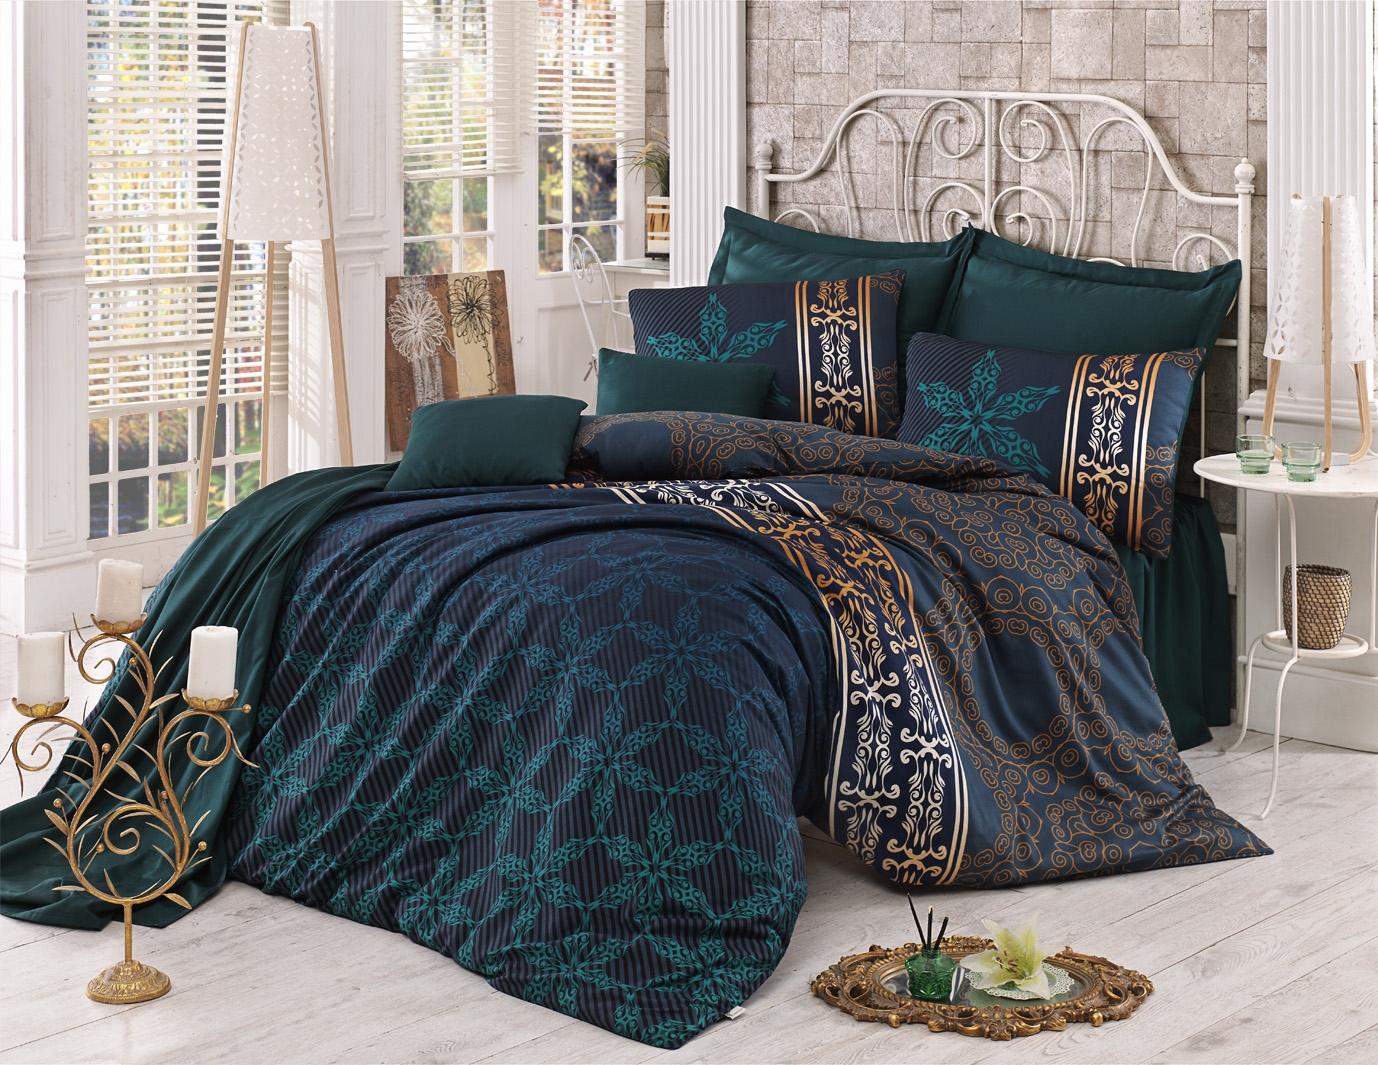 Lenjerie de pat din bumbac Satinat Alisa Verde Inchis / Mustariu, 200 x 220 cm imagine